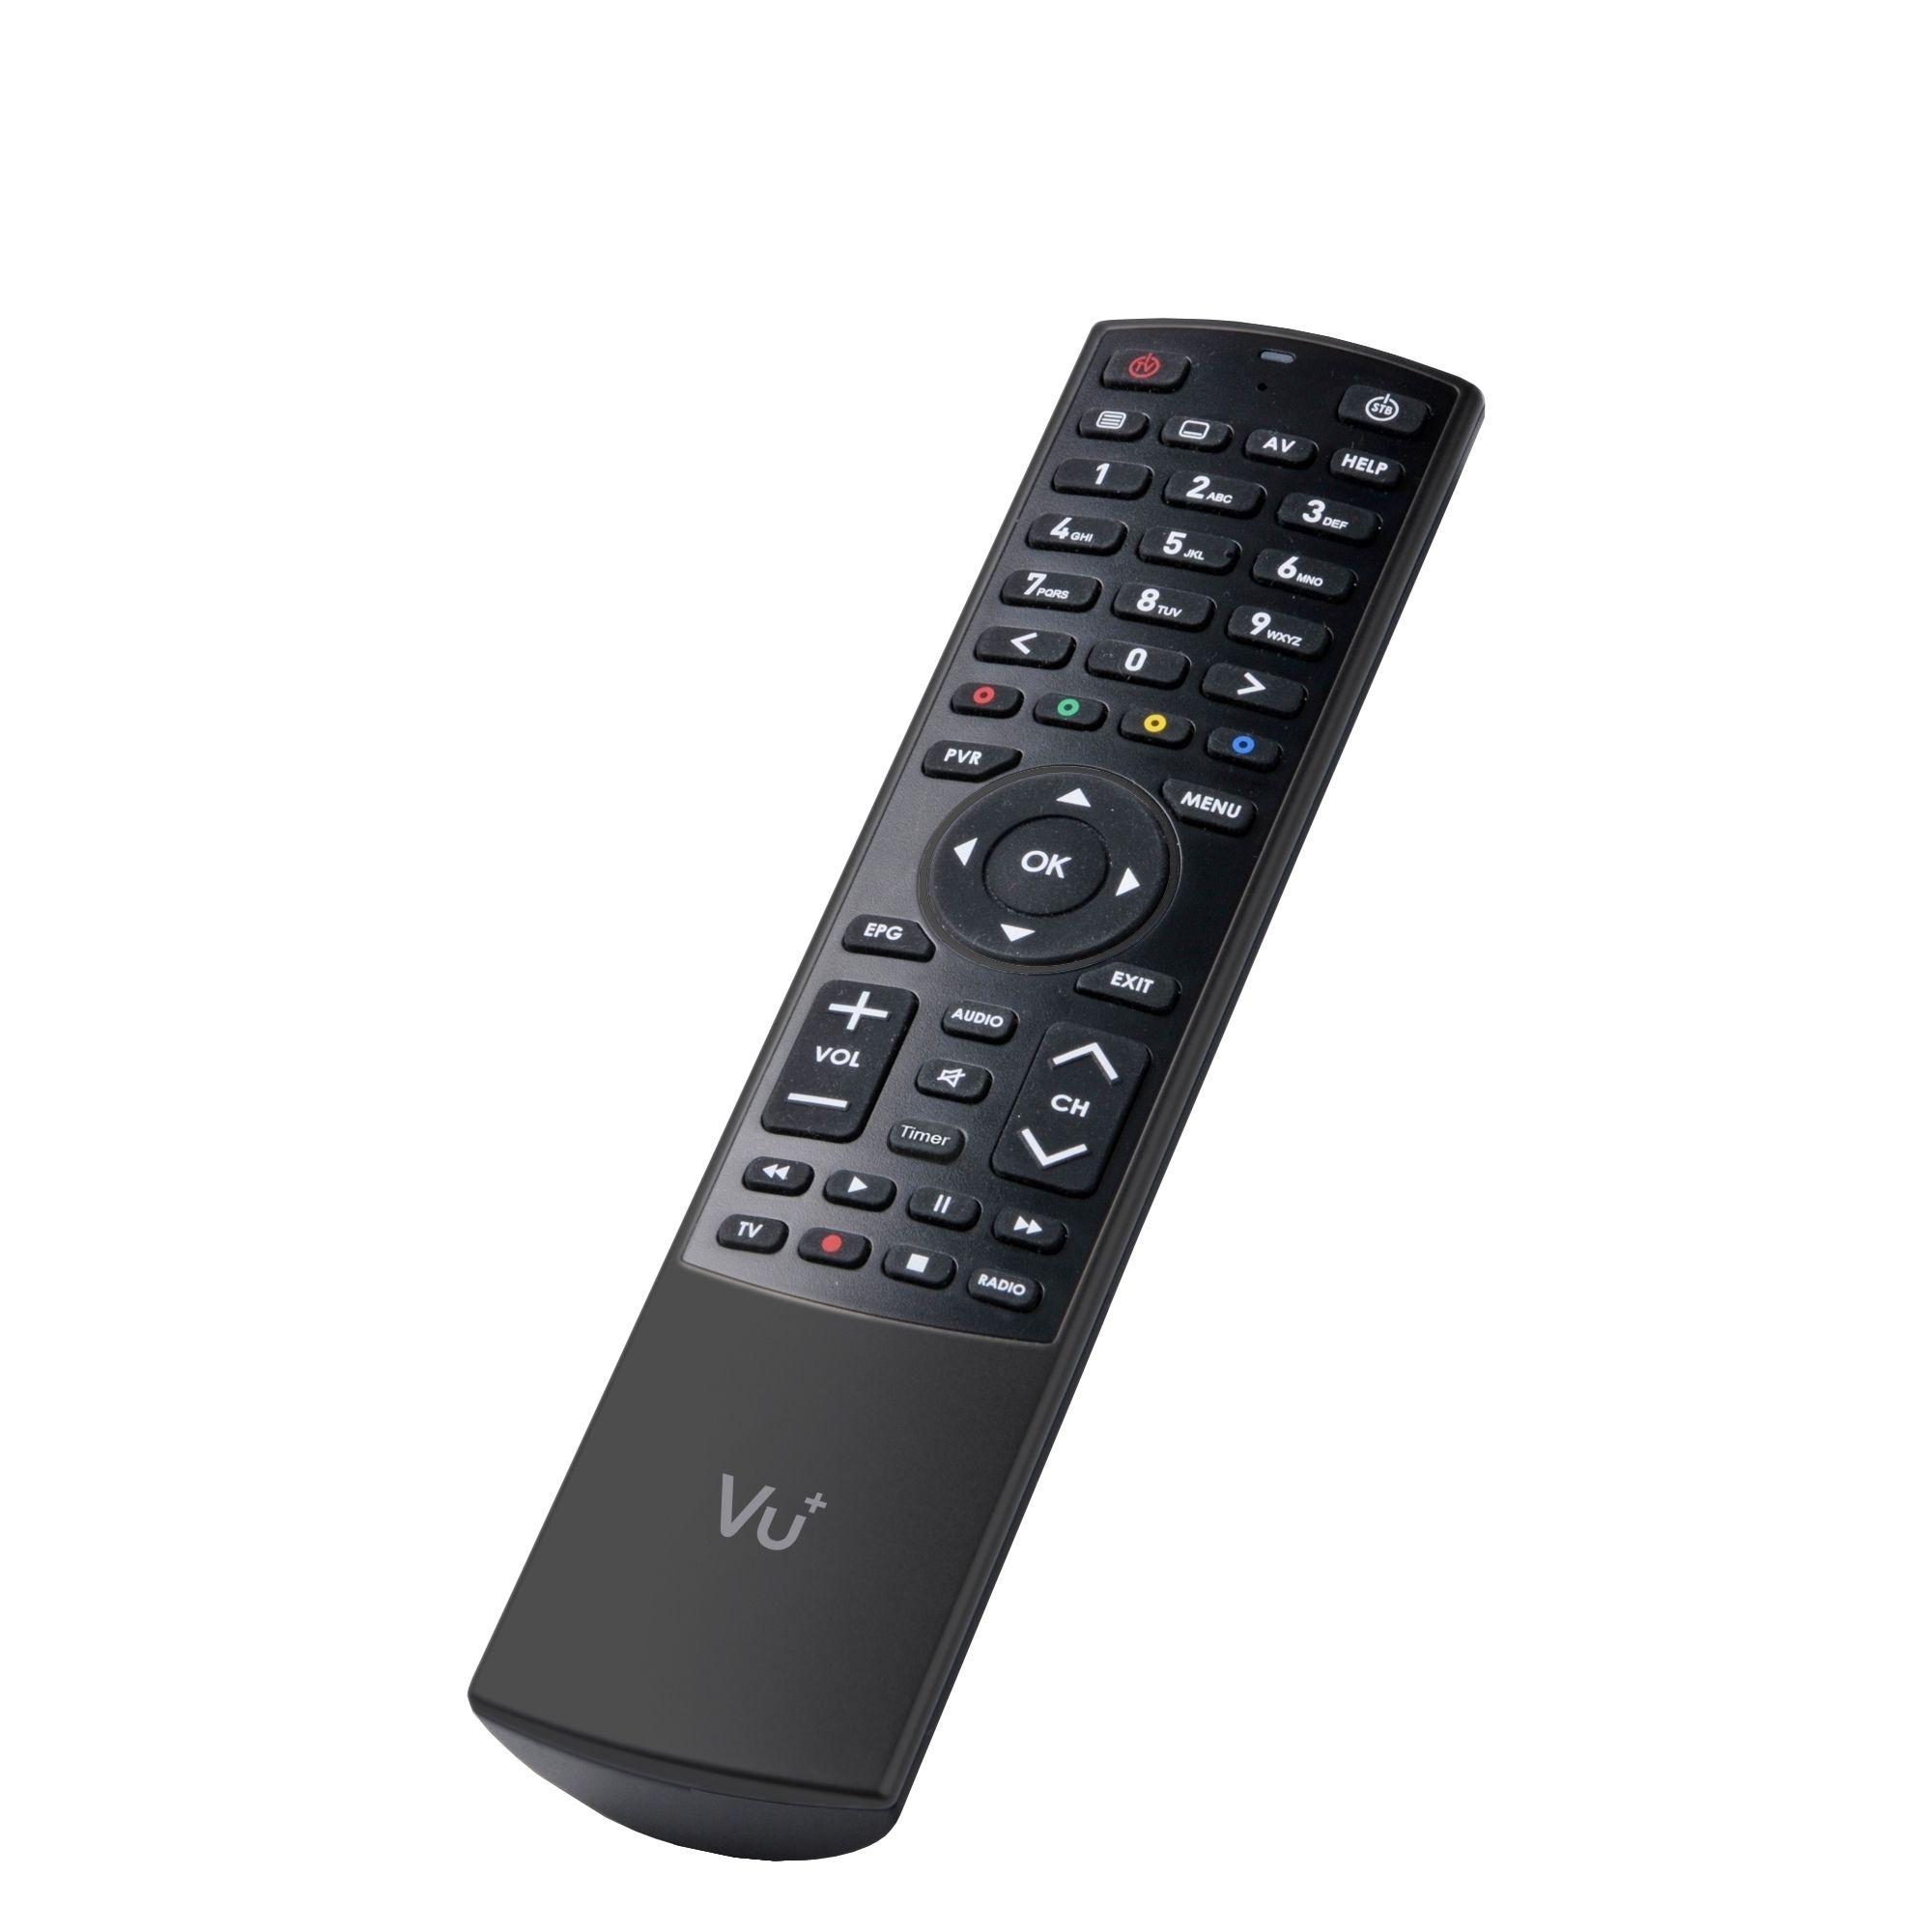 VU+Zero 4K 1x DVB-S2X Multistream Tuner Linux Receiver UHD 2160p